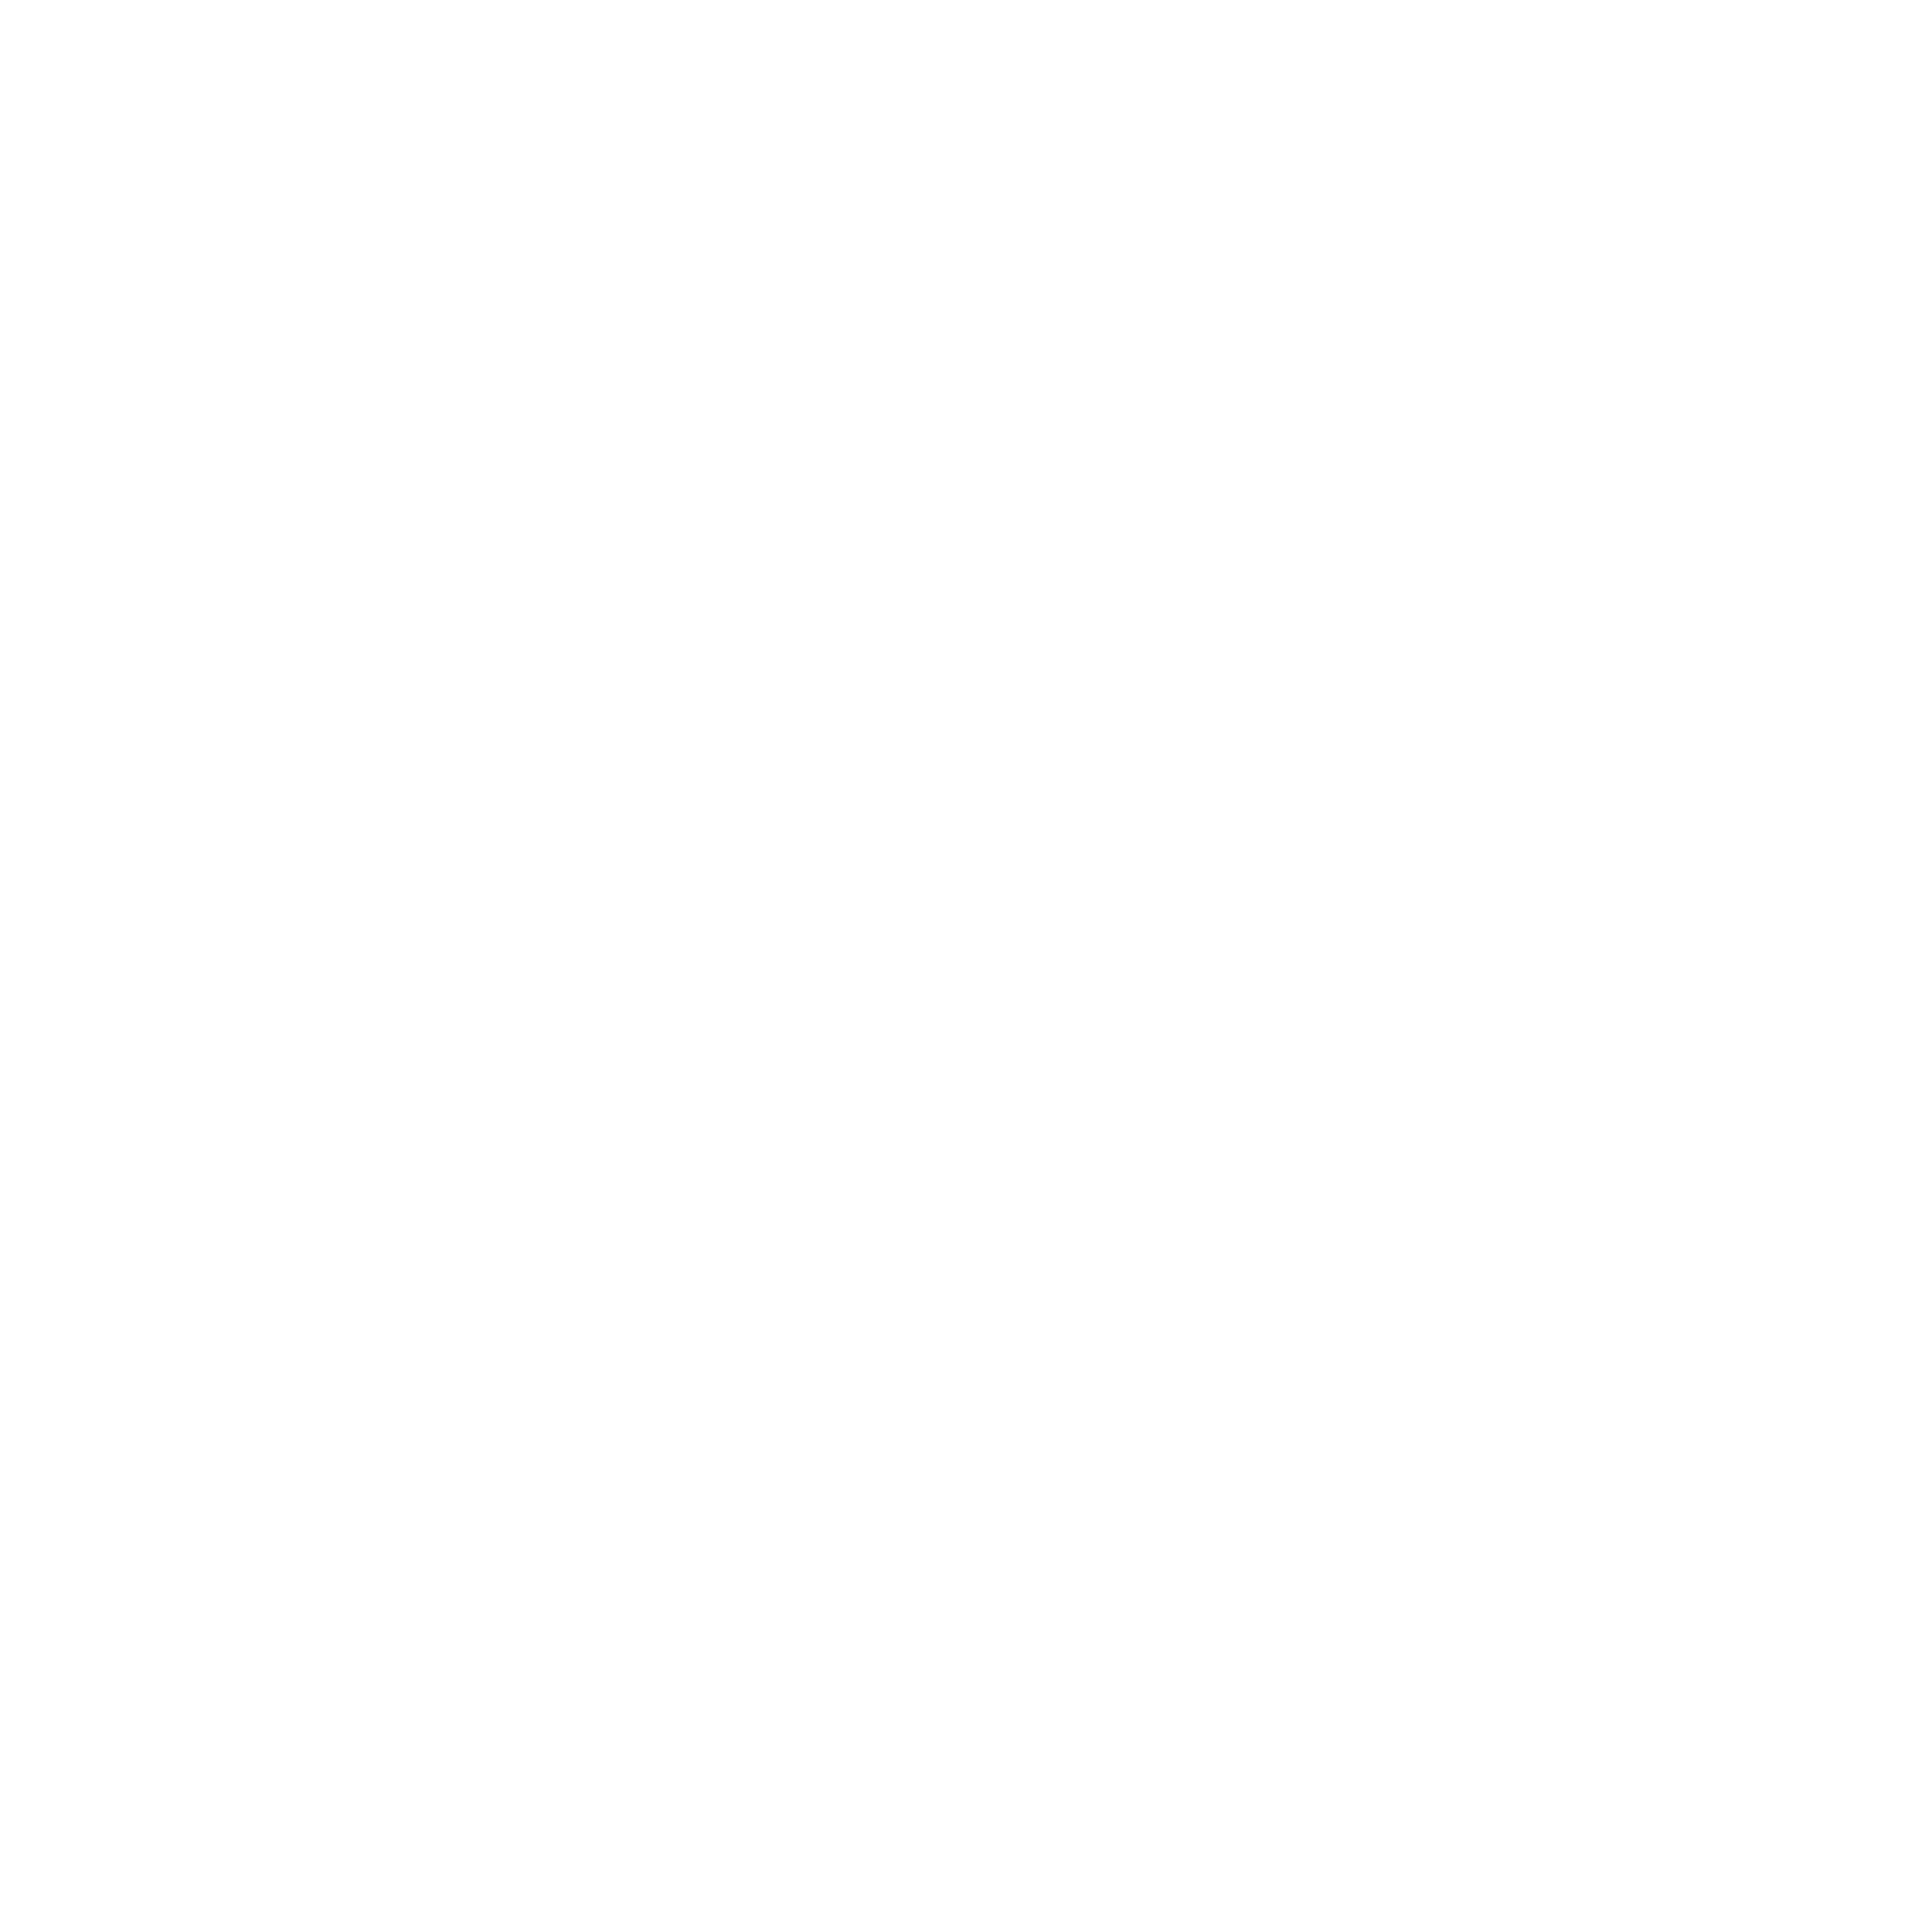 aeternite_logo_2